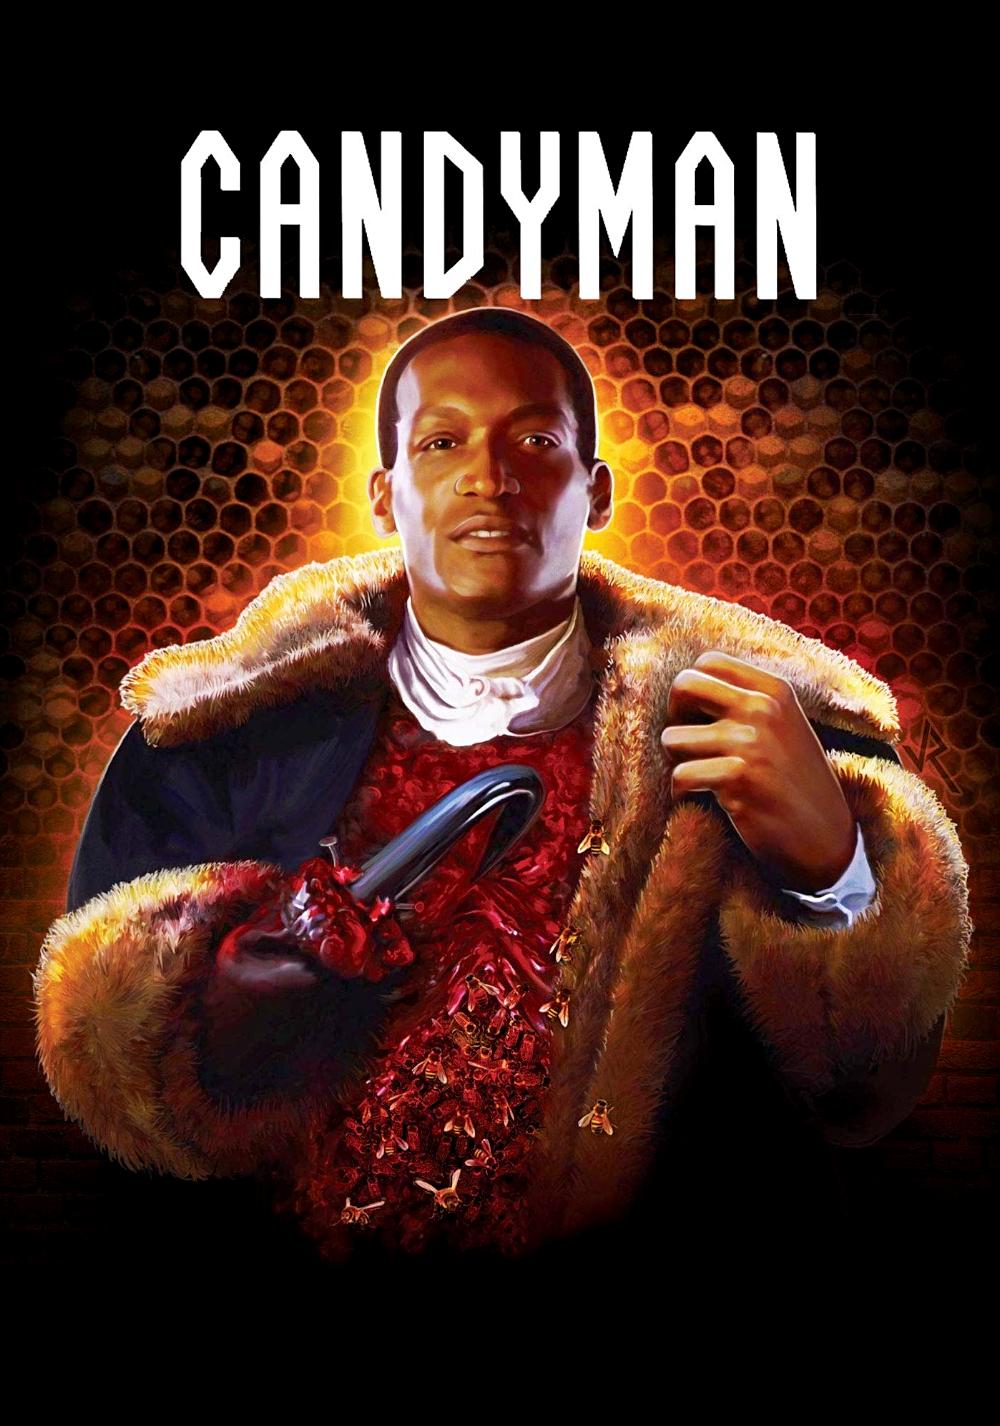 candyman-5c9e4d5c4c102.jpg